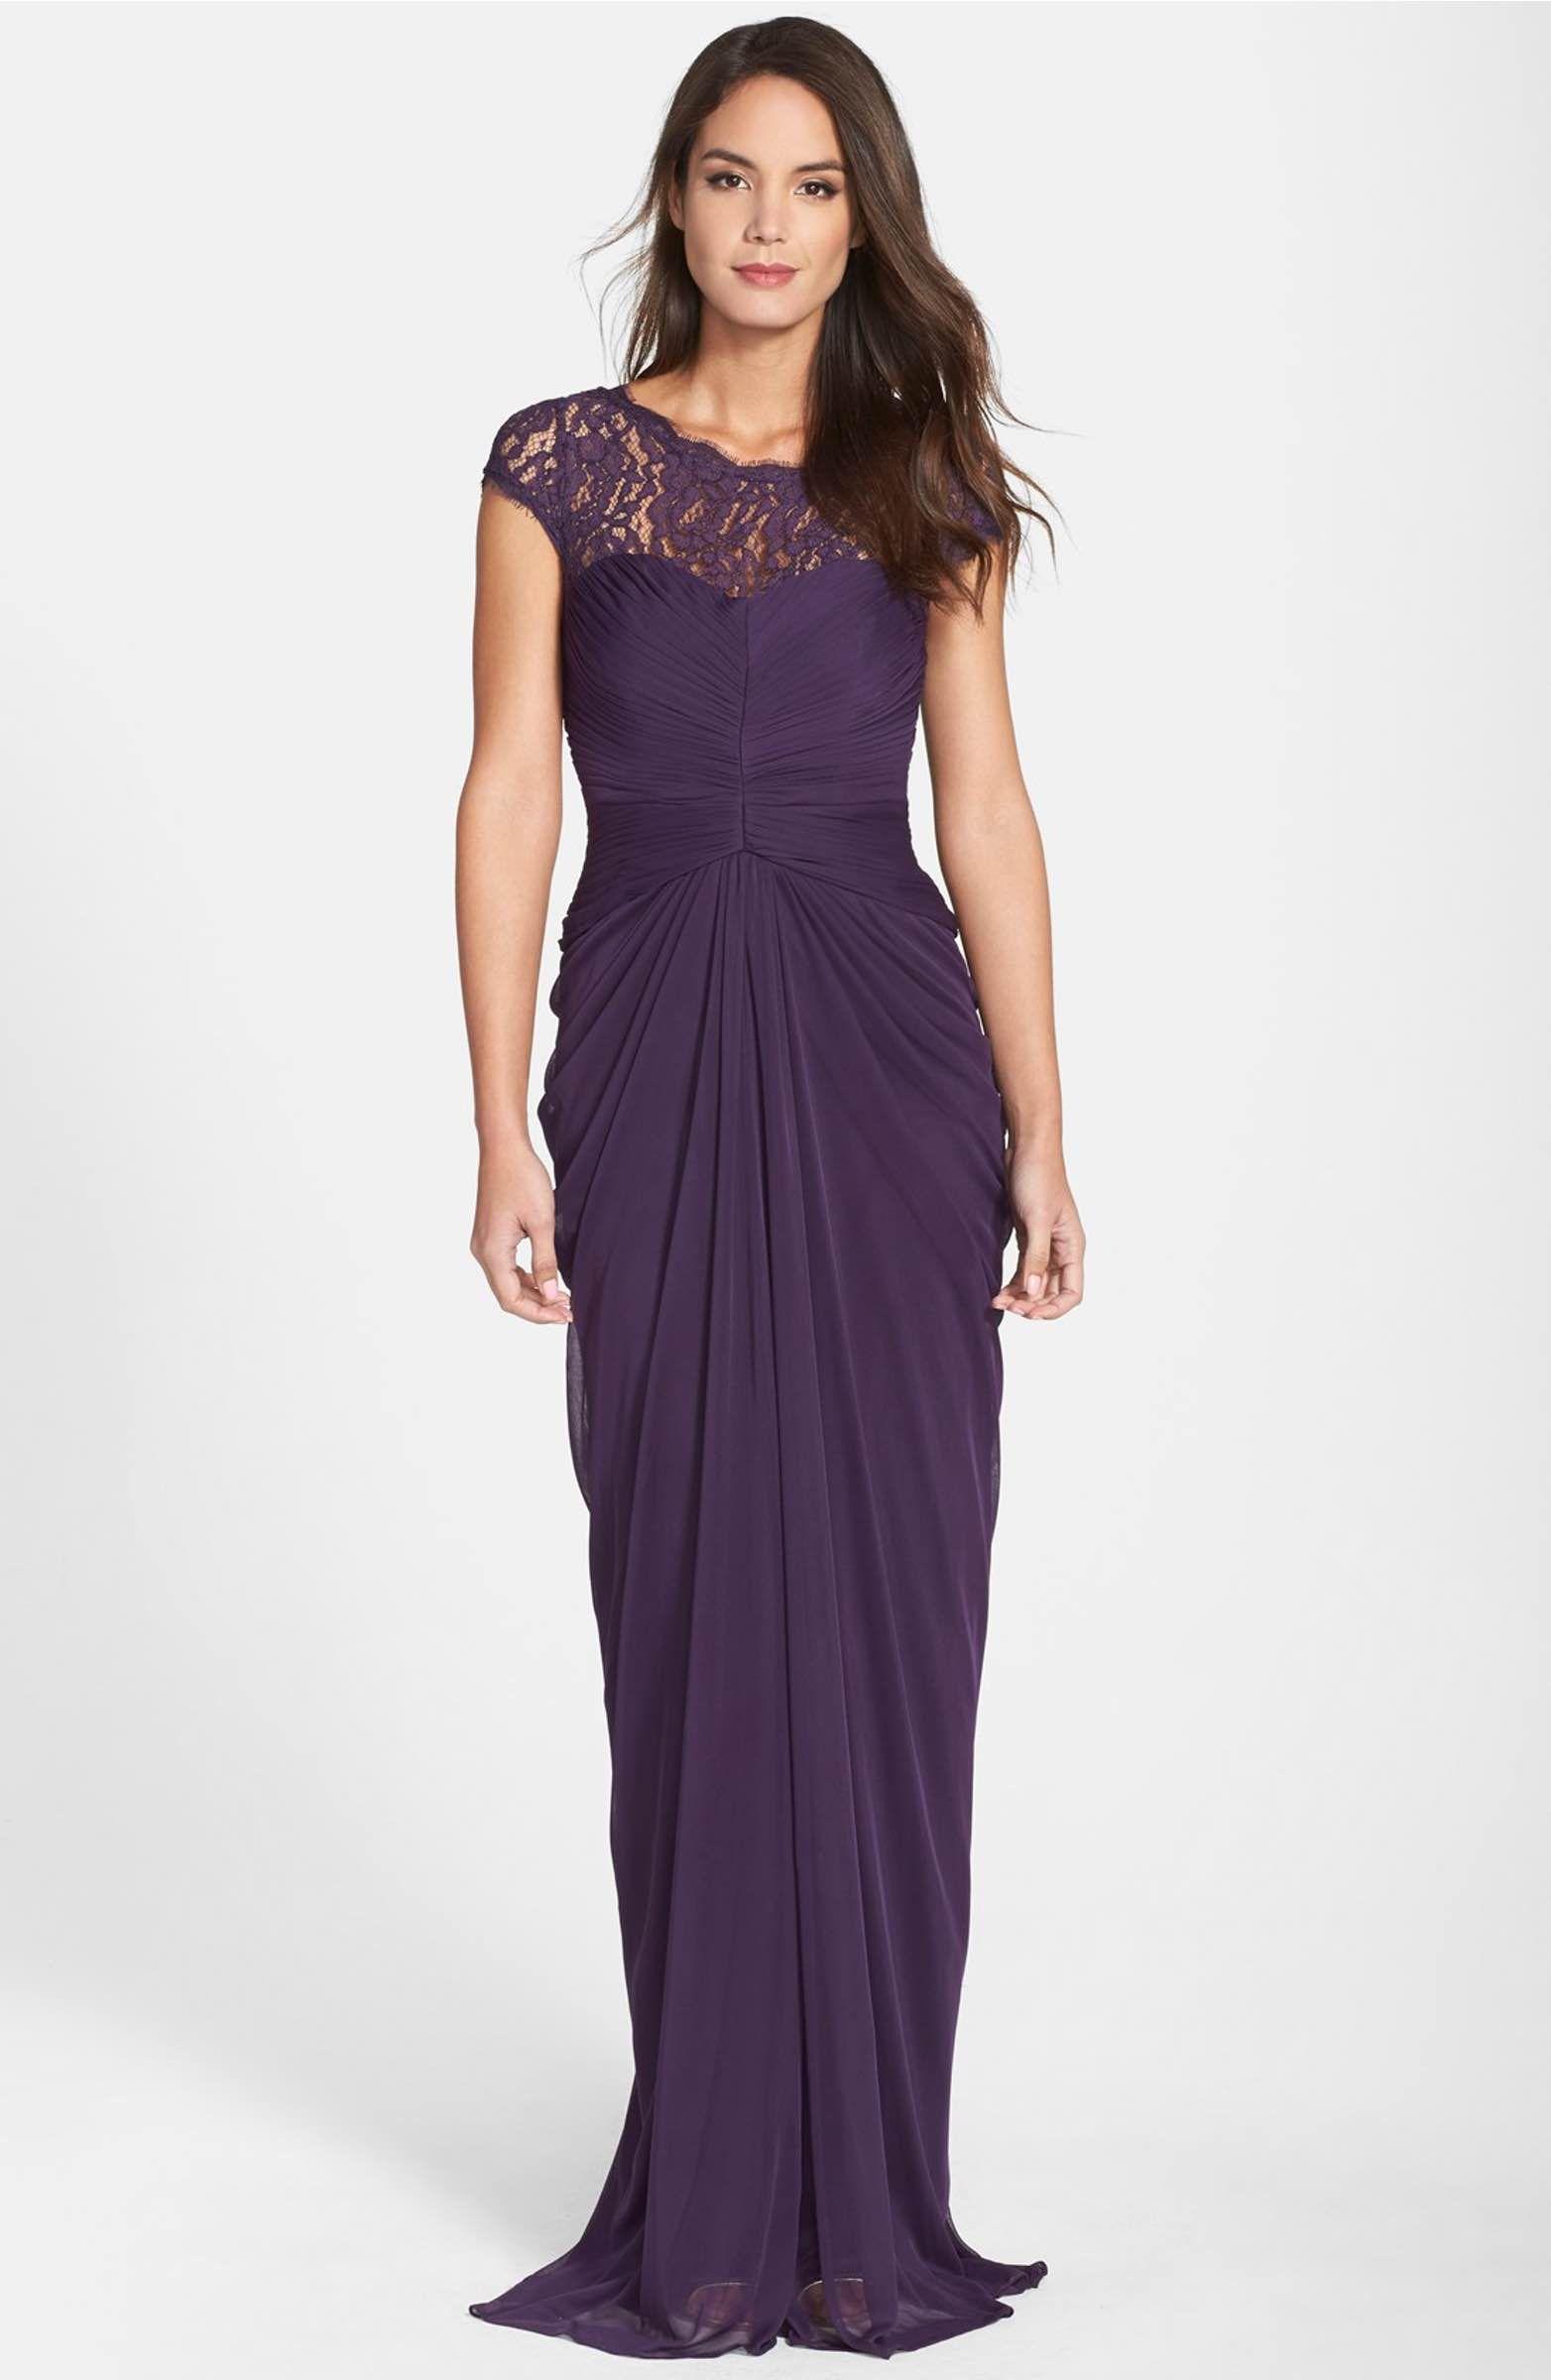 Main Image - Adrianna Papell Lace Yoke Drape Gown | Weddings ...